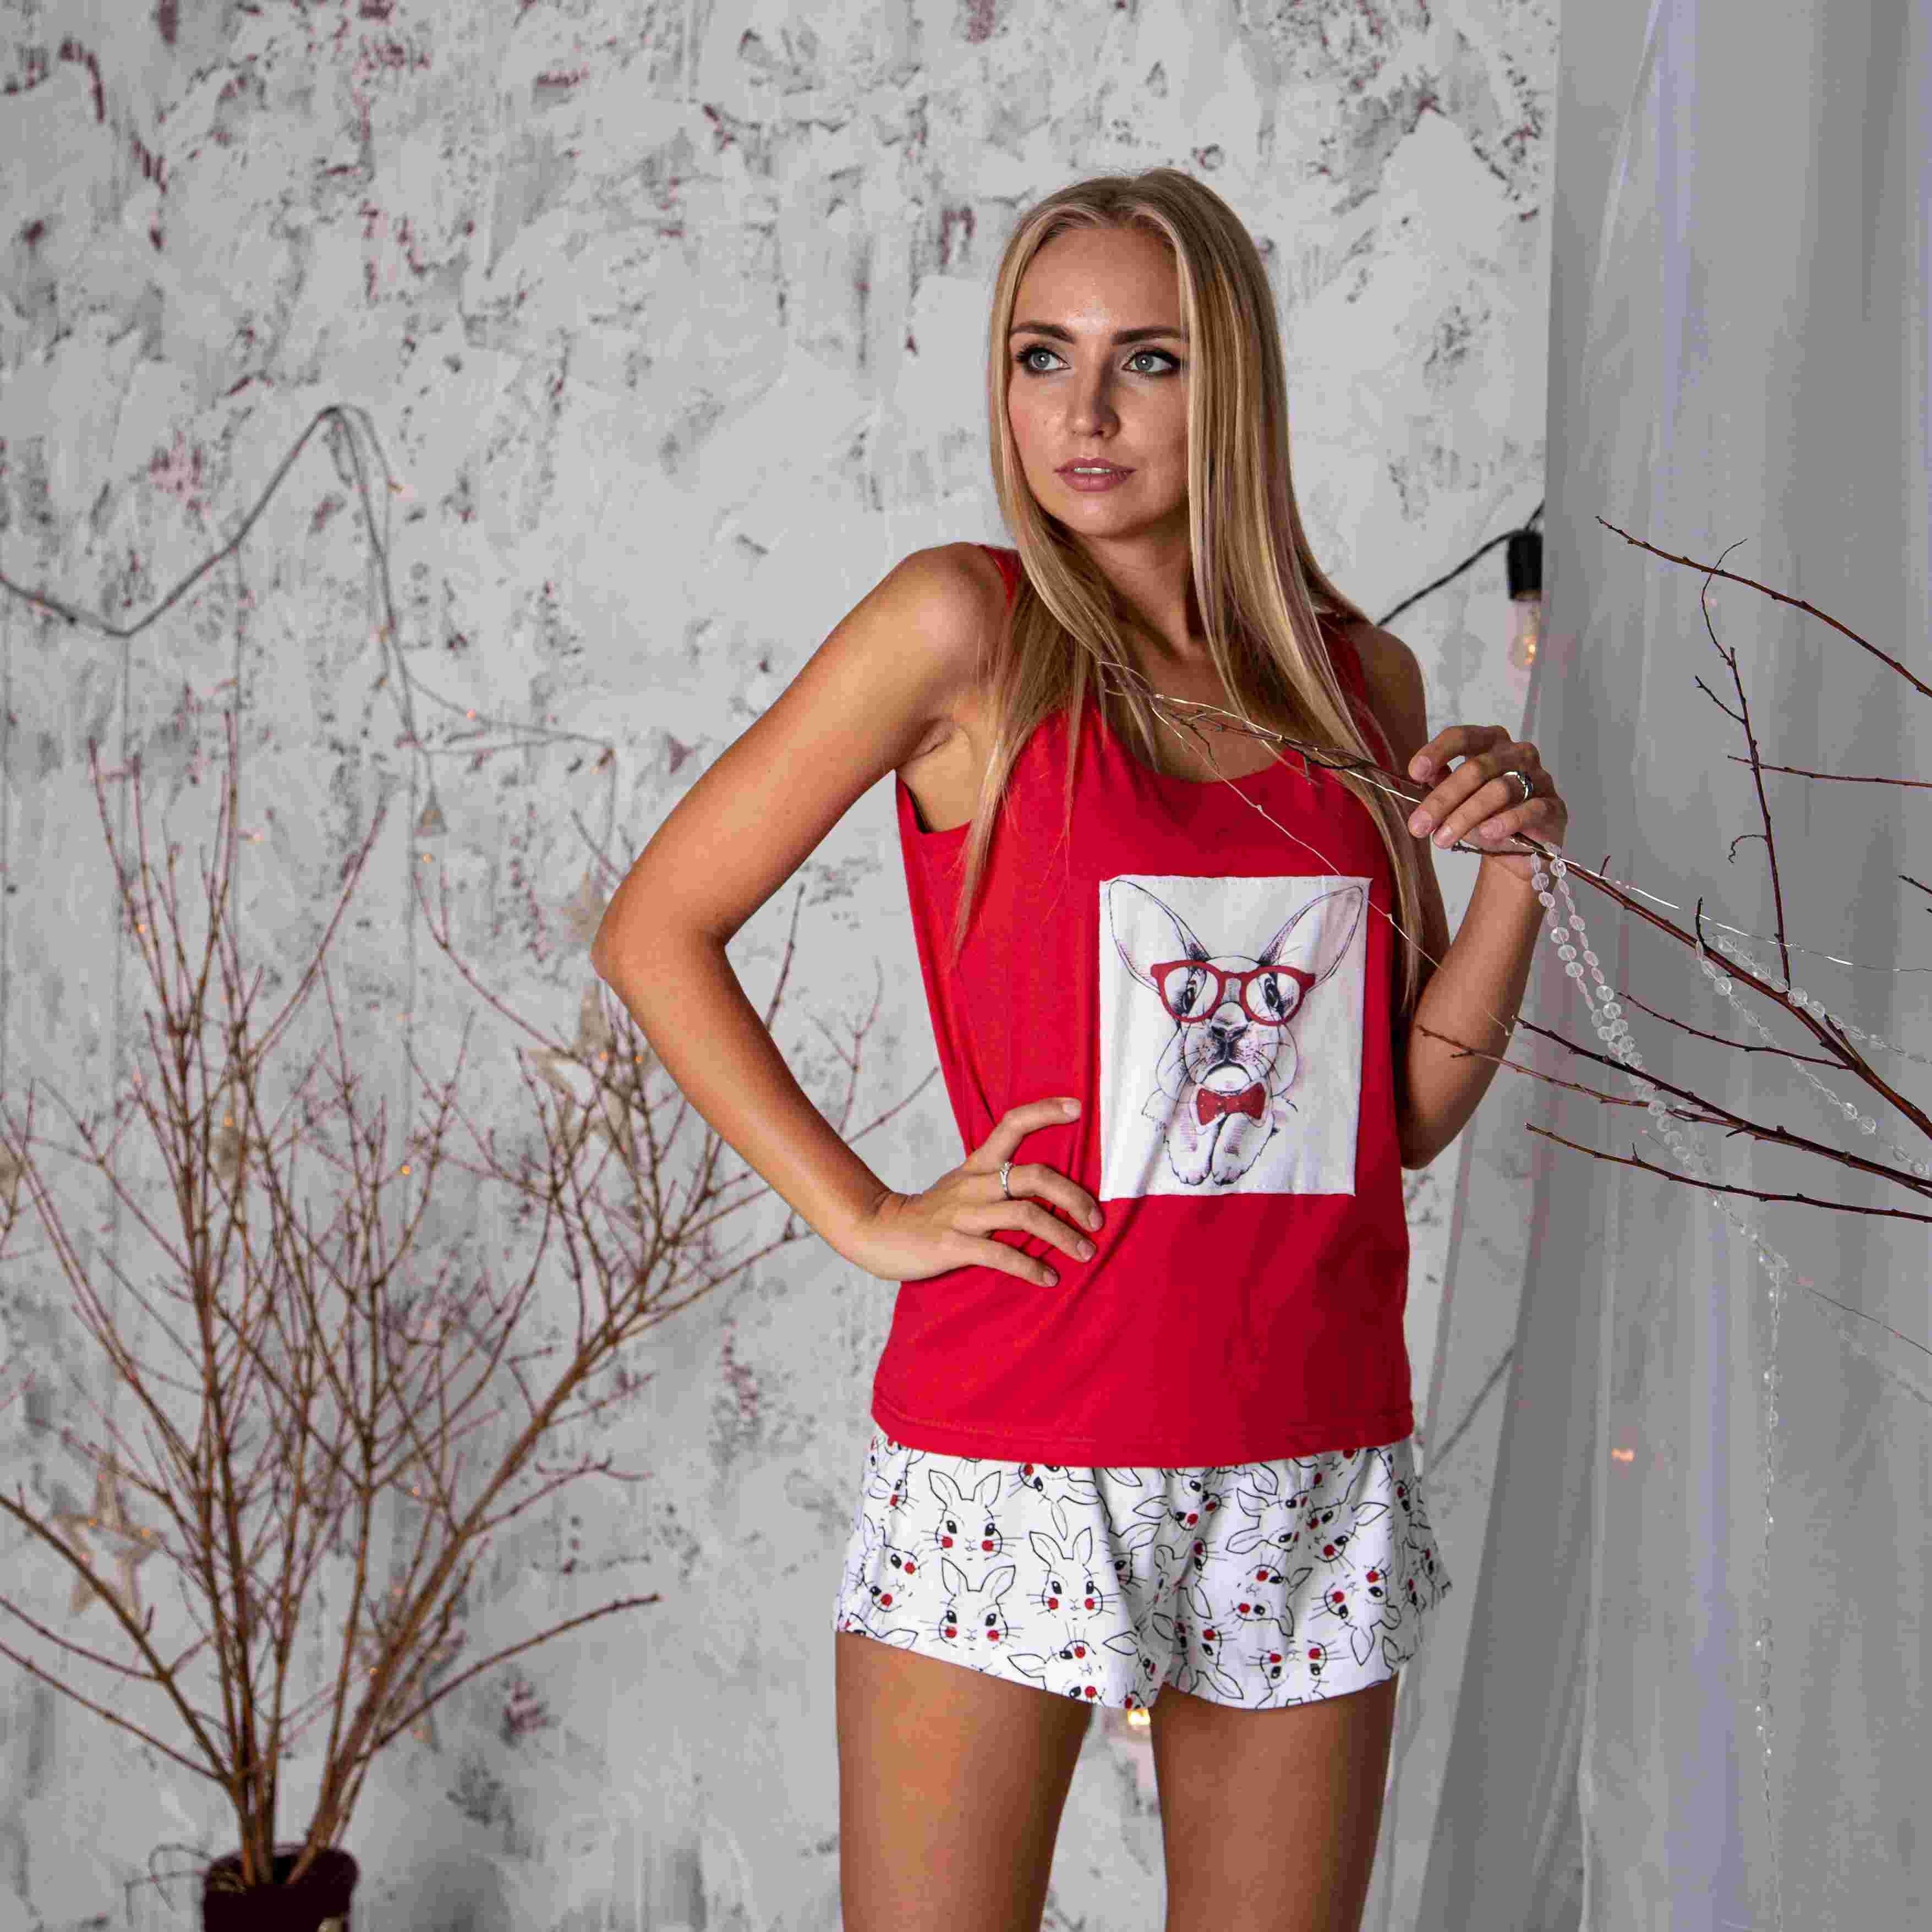 Atoff casa pijamas feminino zhp 023 (cornflower/vermelho/preto + lebres)